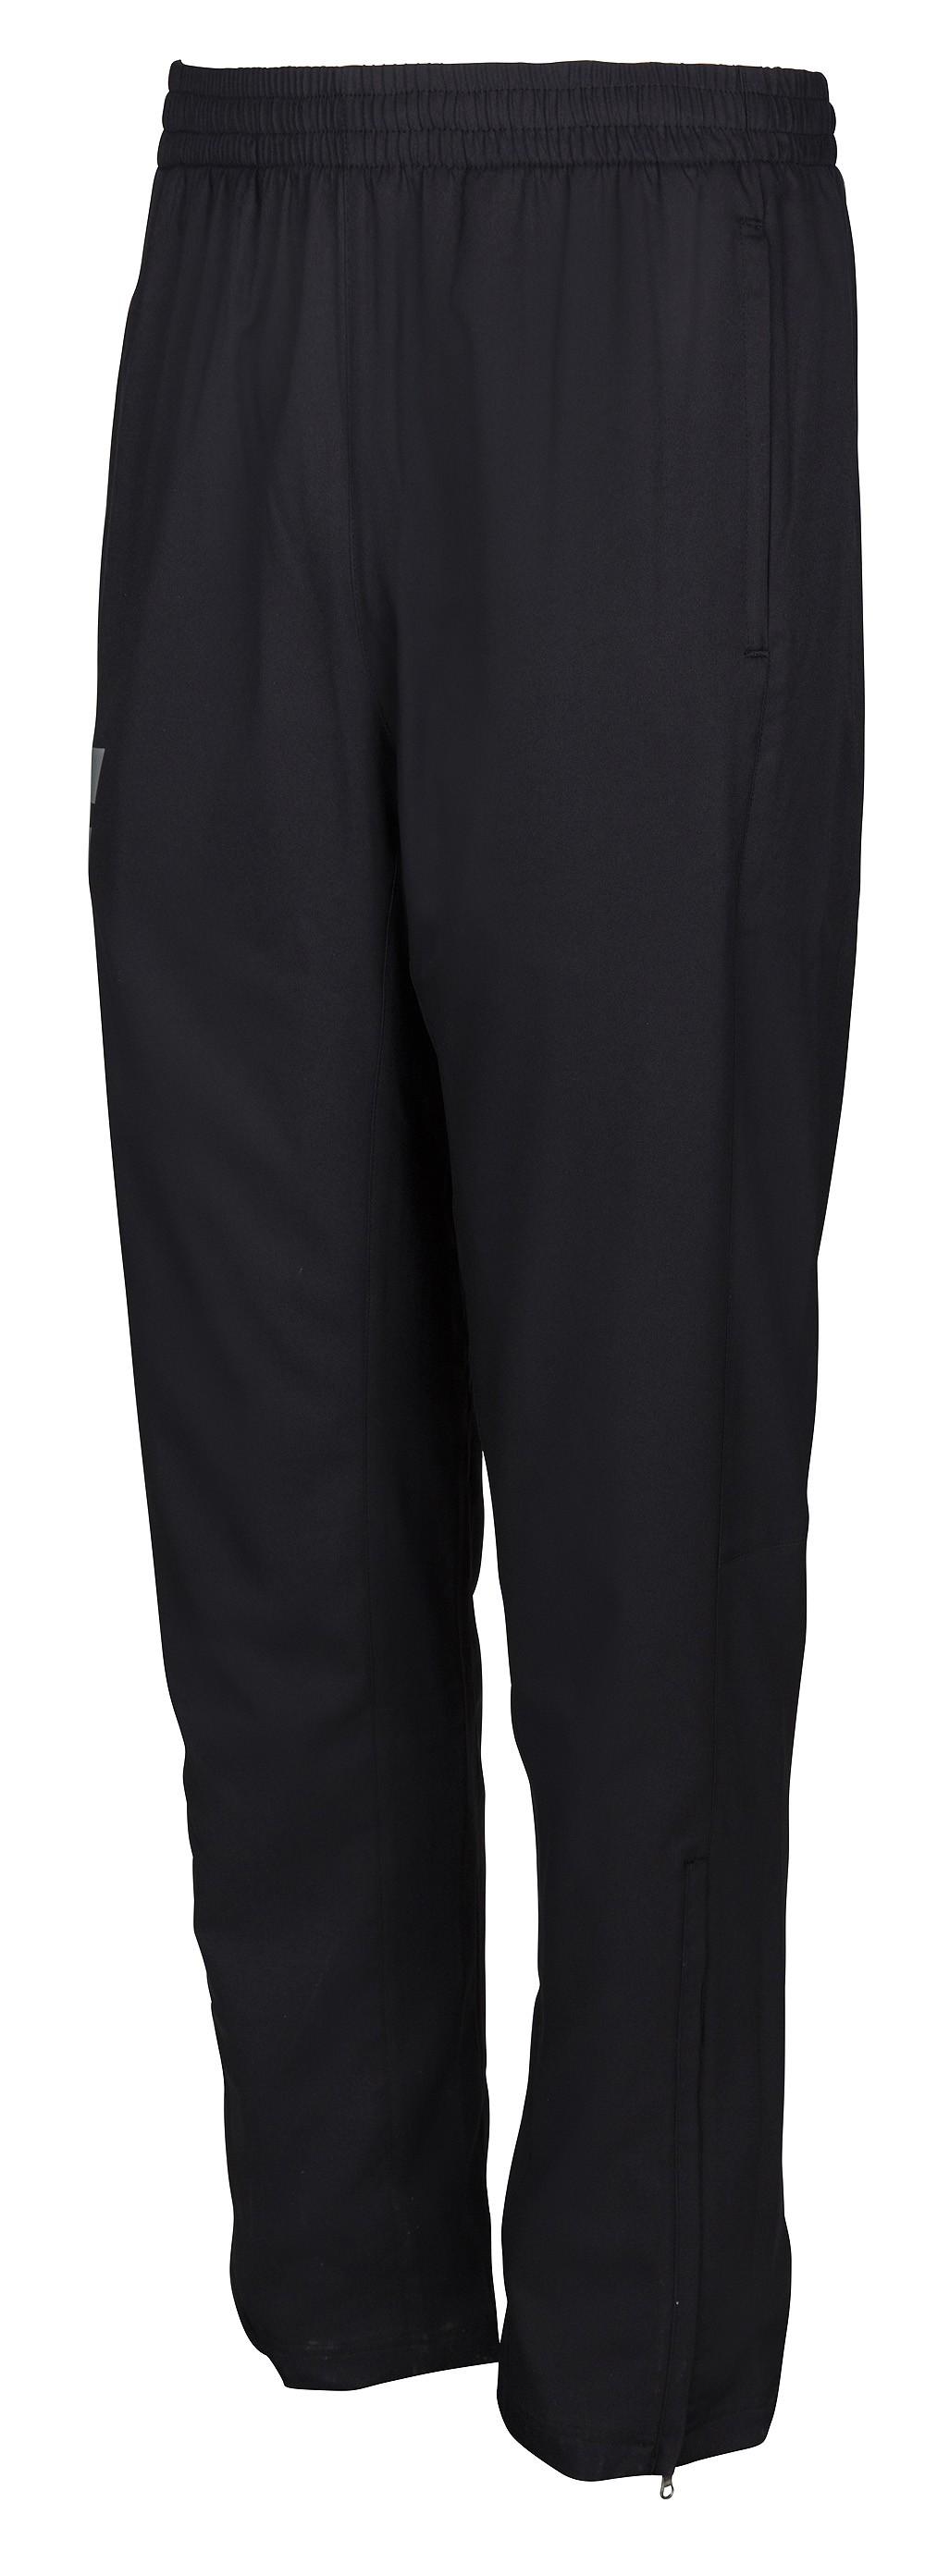 Spodnie tenisowe Babolat Pants Core Black